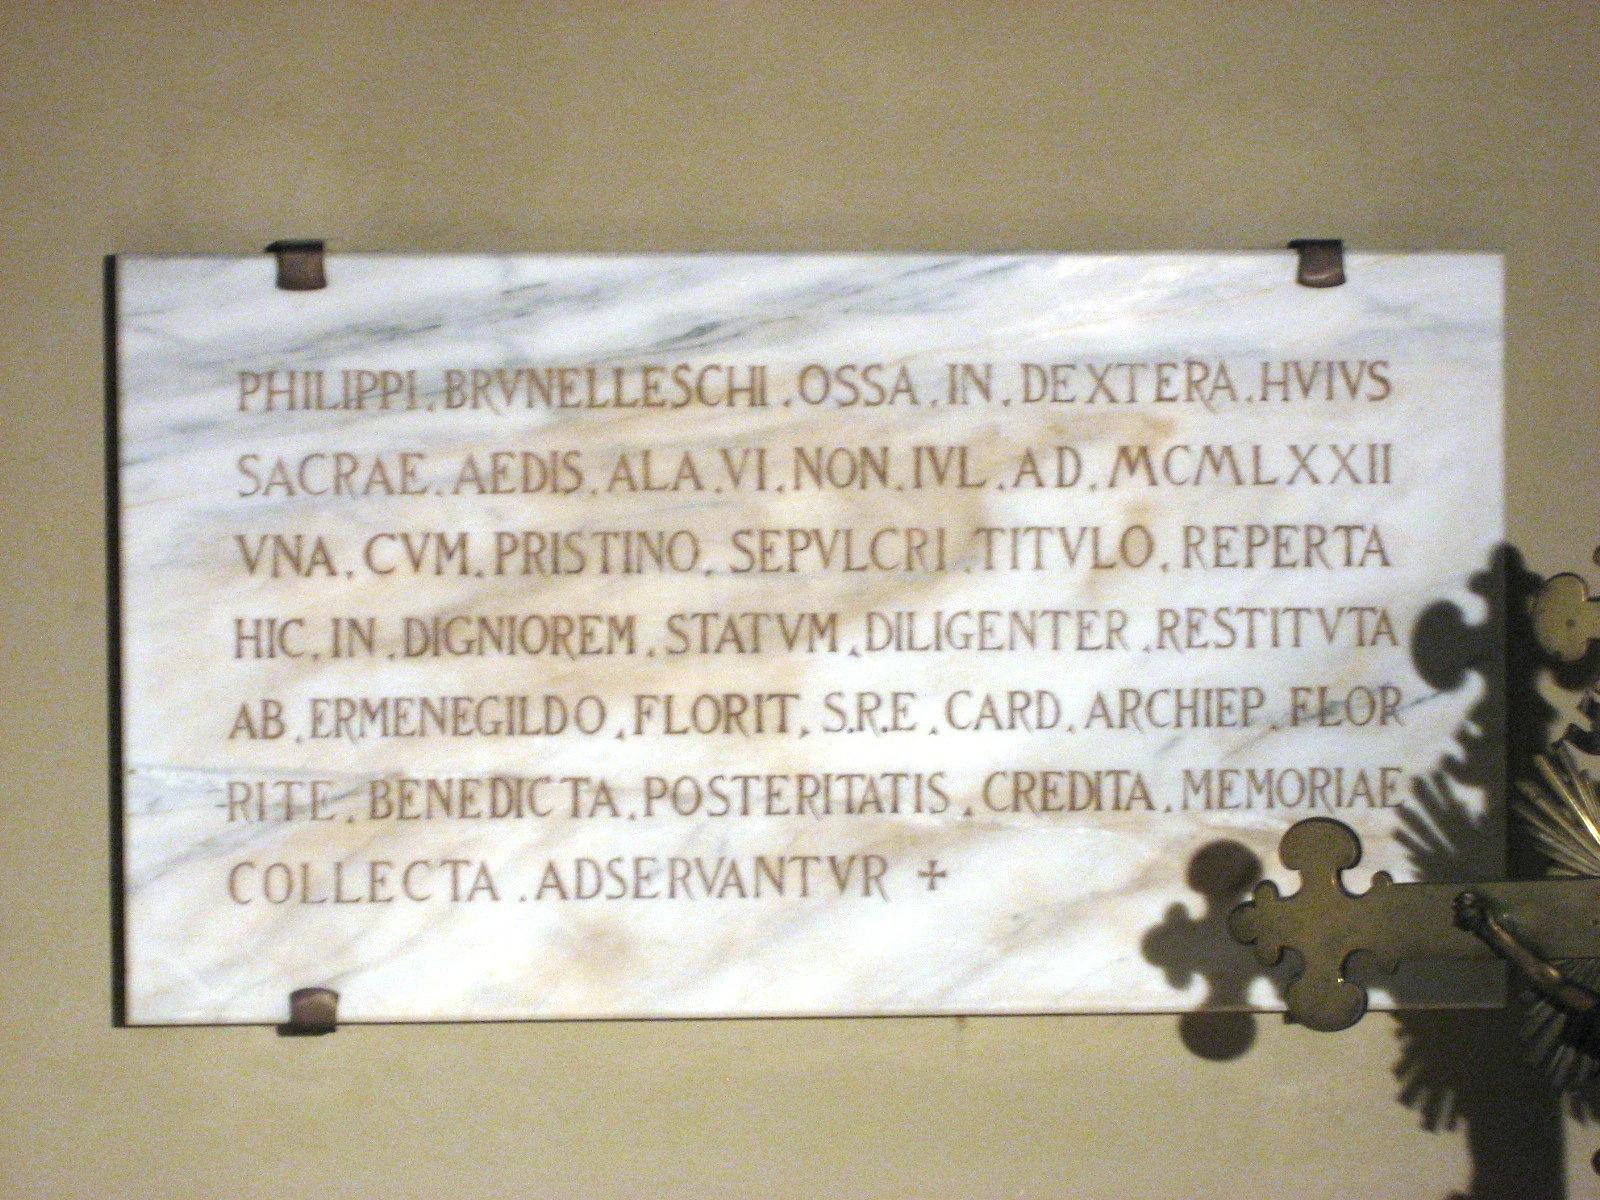 Ab Creative Scandicci file:duomo firenze apr 2008 (14) - wikimedia commons